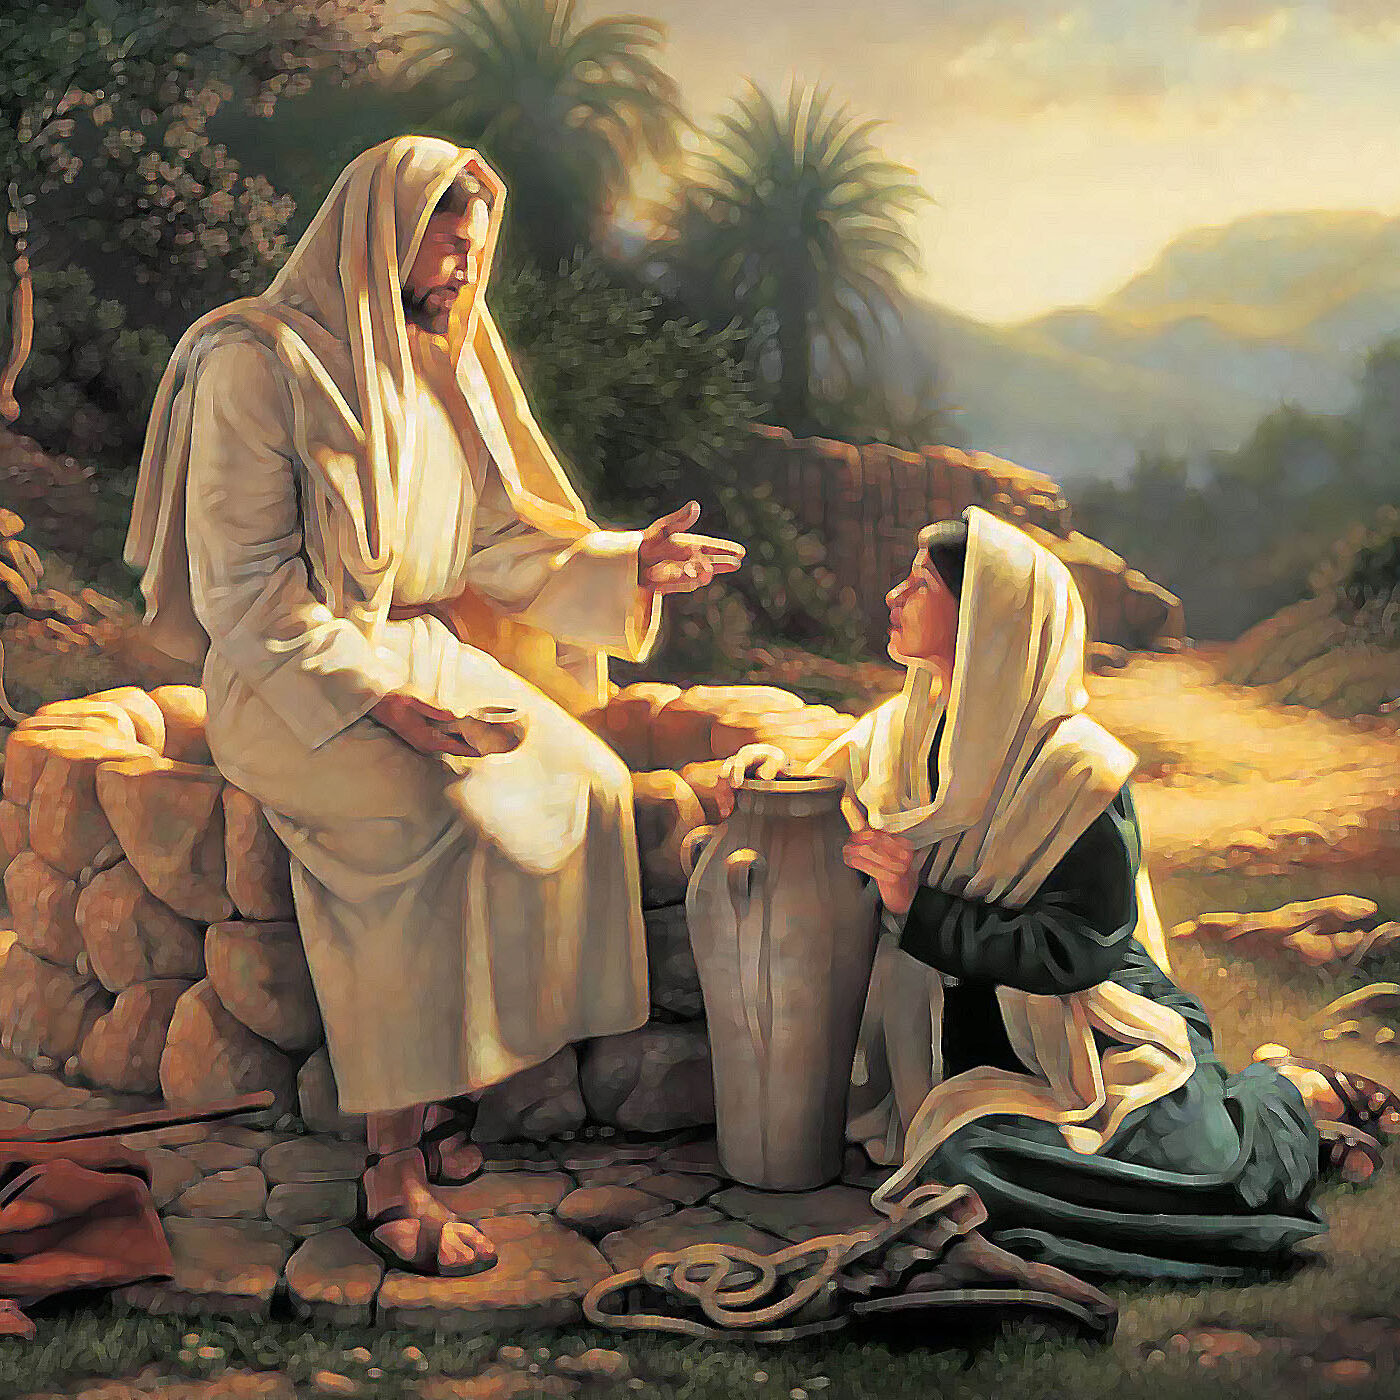 riflessioni sul Vangelo di Mercoledì 23 Dicembre 2020 (Lc 1, 57-66) - Apostola Janel